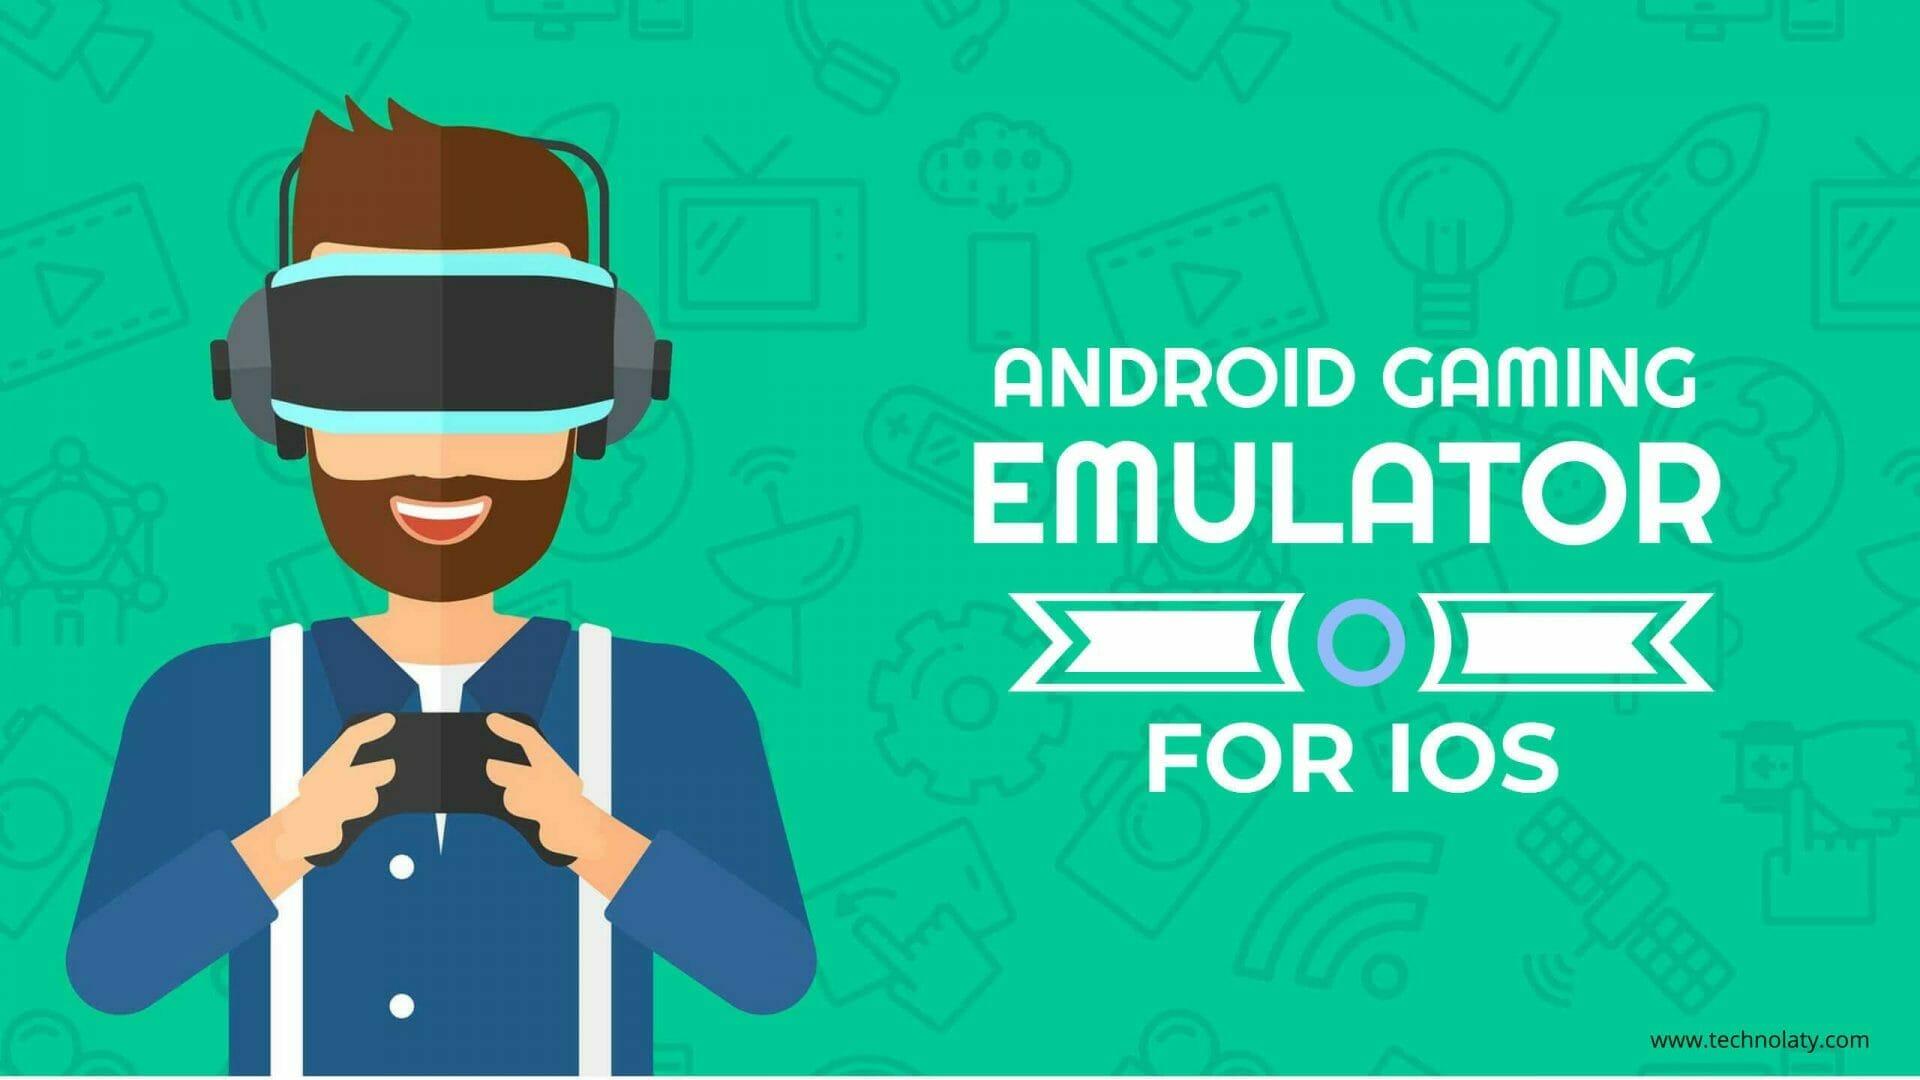 IOS Gaming Emulator for pc